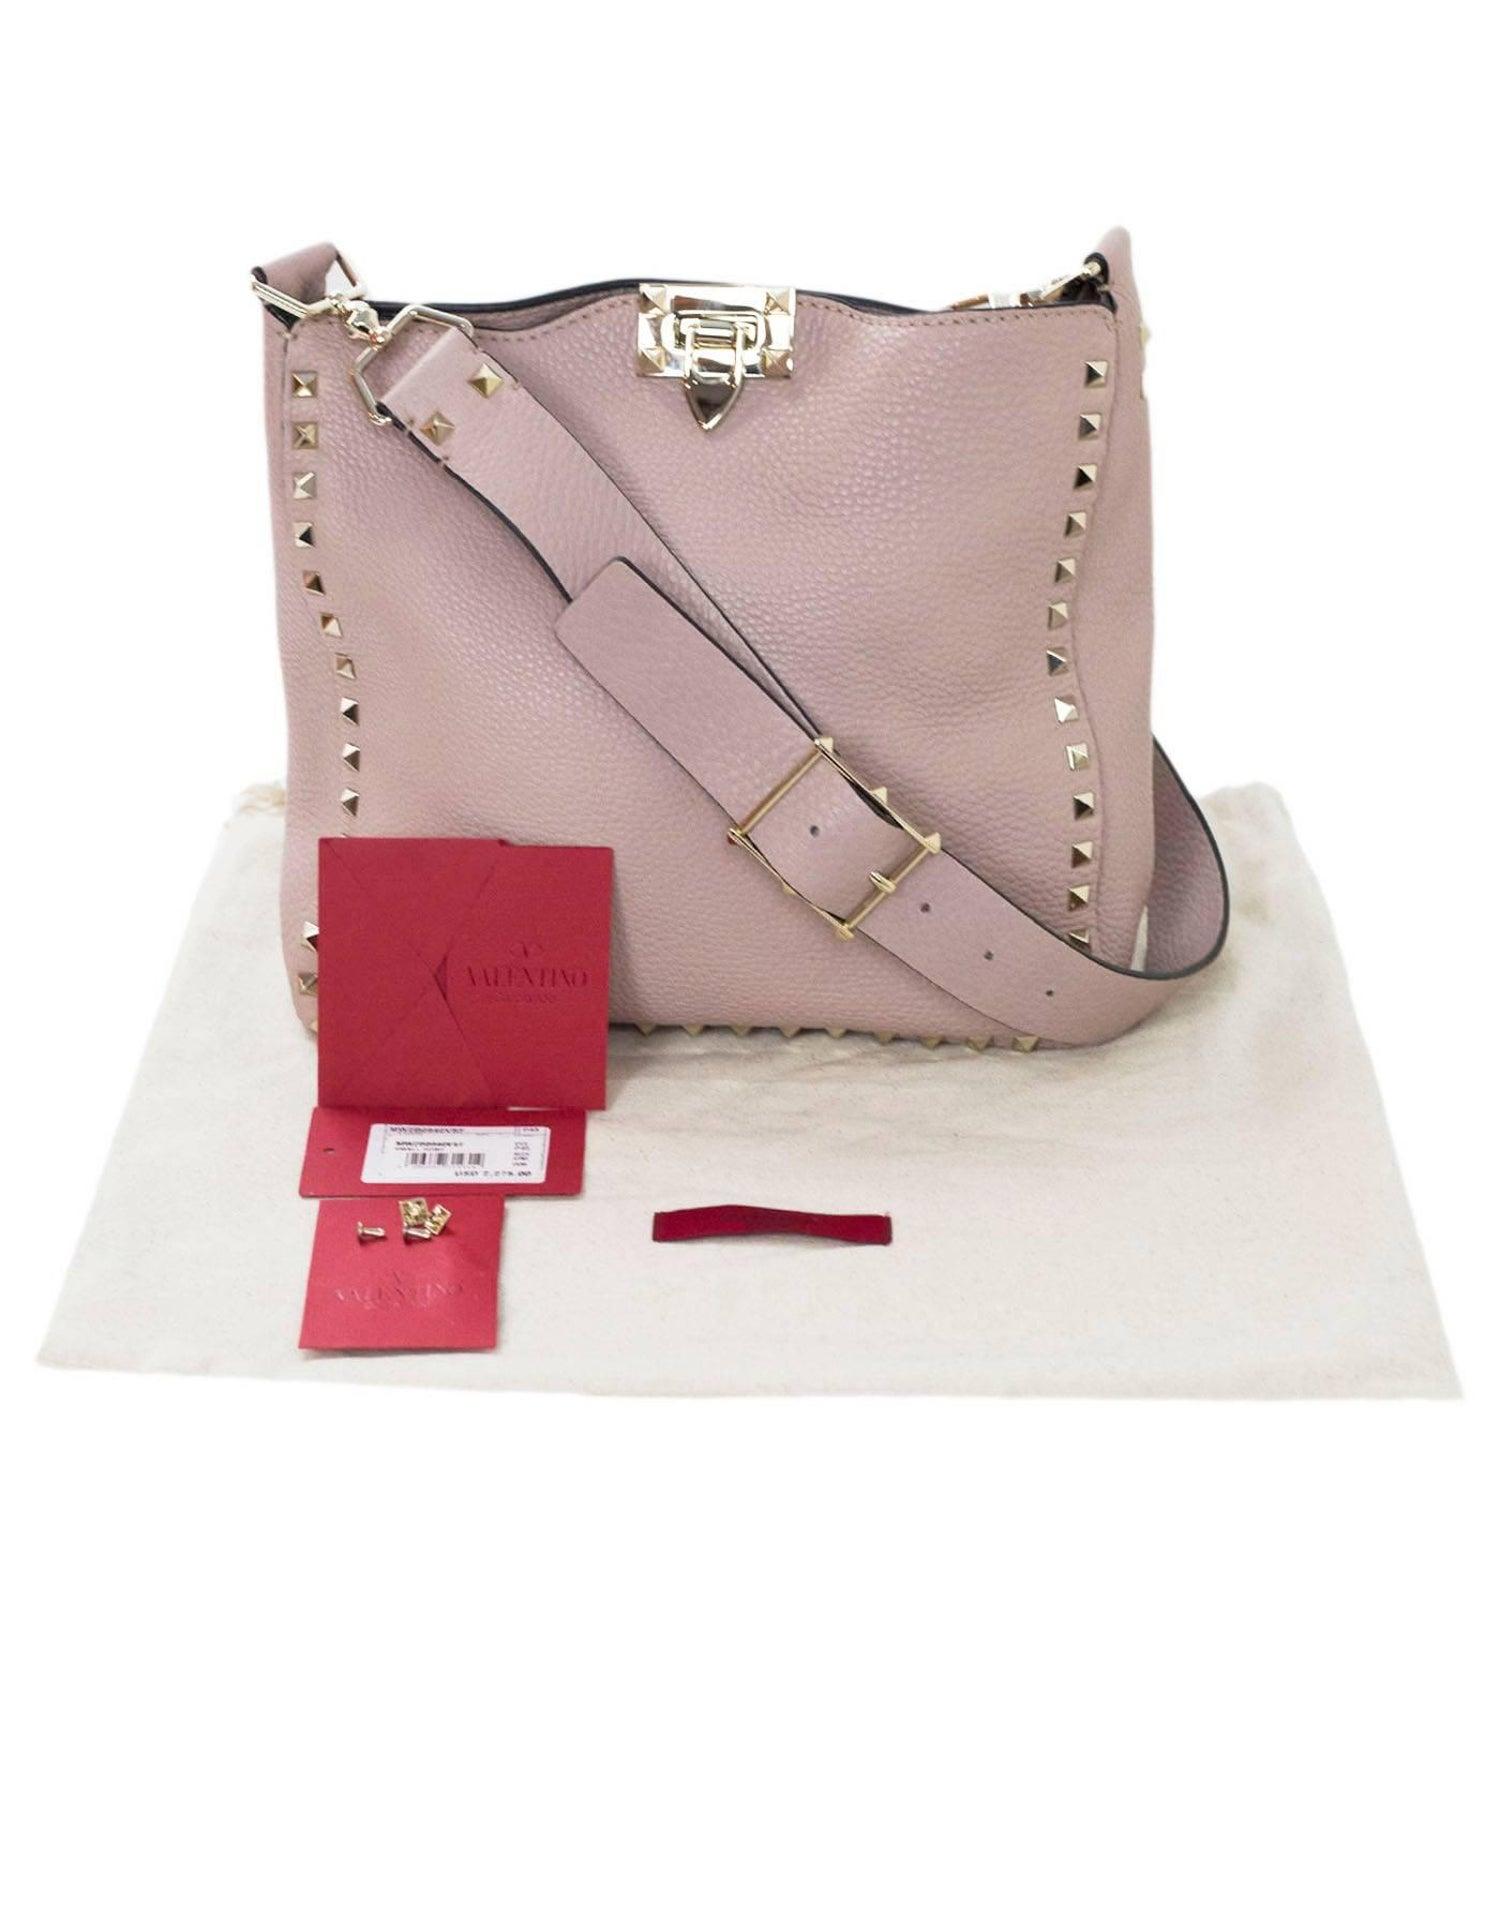 02bab8db635f Valentino Blush Leather Rockstud Small Hobo Messenger Bag with DB For Sale  at 1stdibs